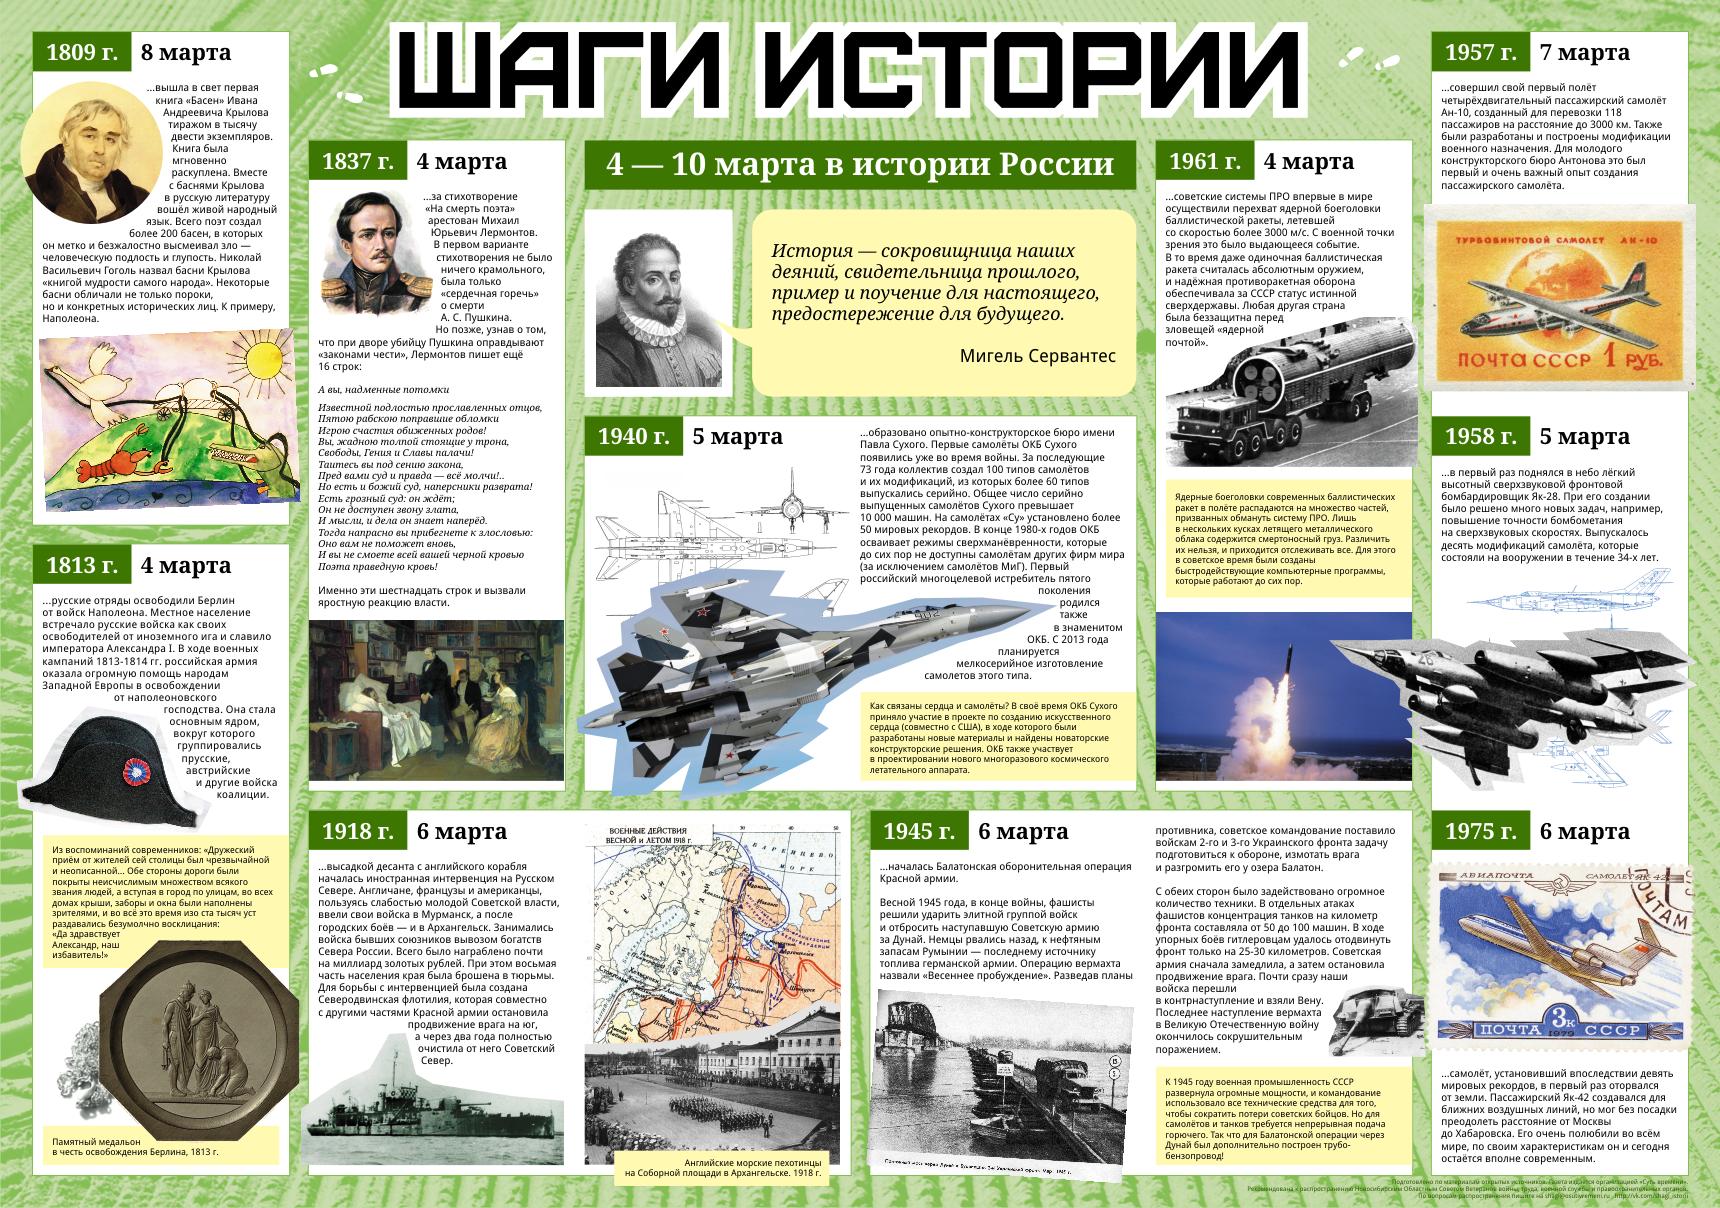 Анализ дизайна газеты